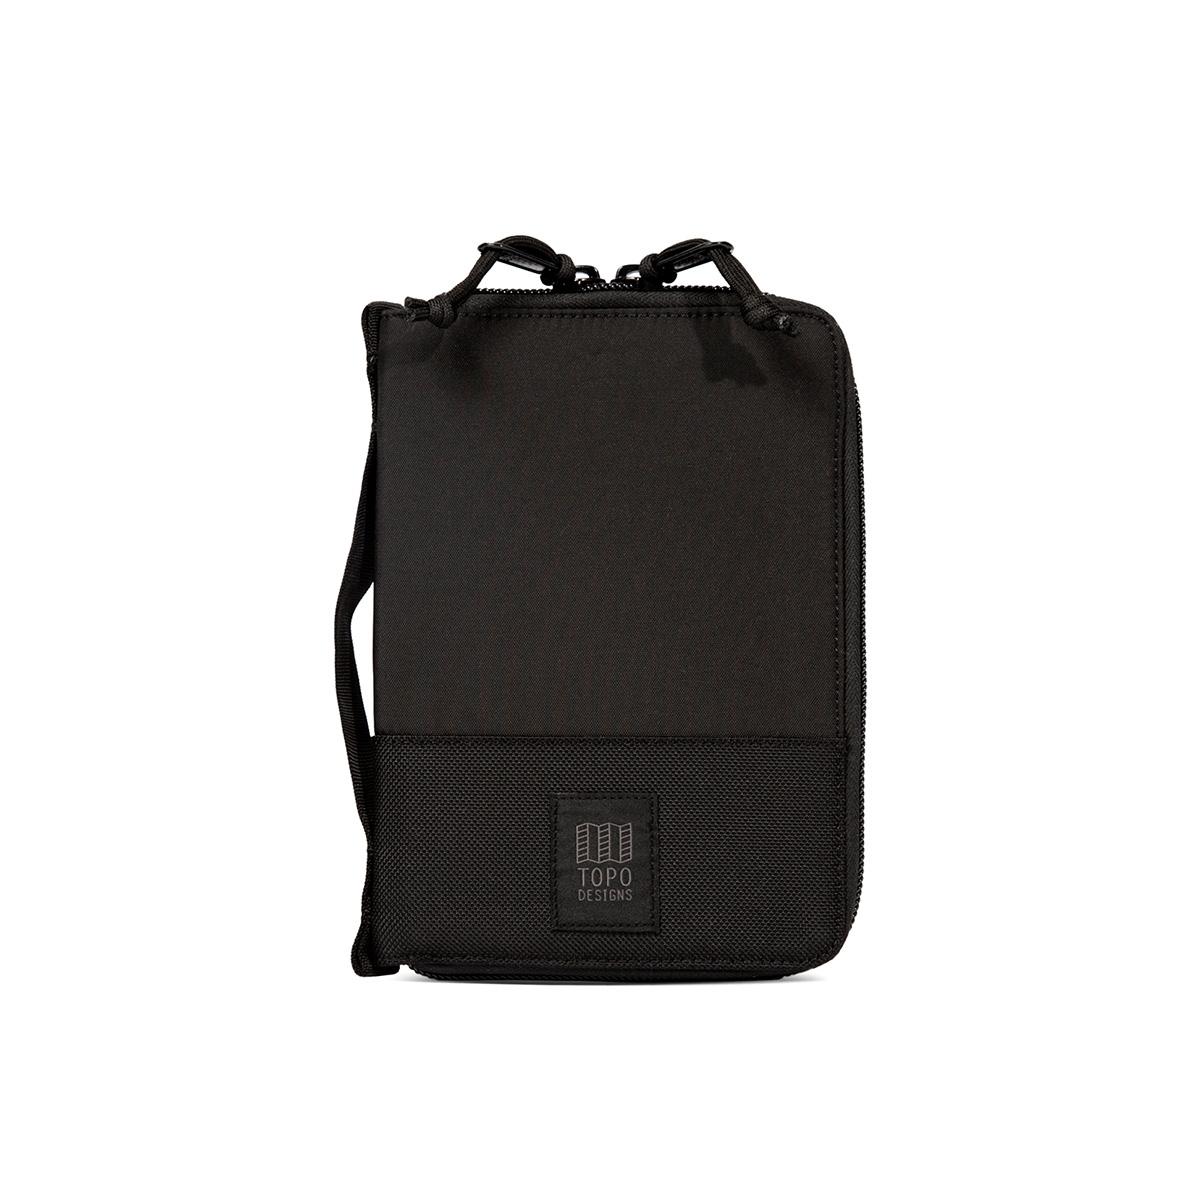 Topo Designs Global Case Ballistic Black